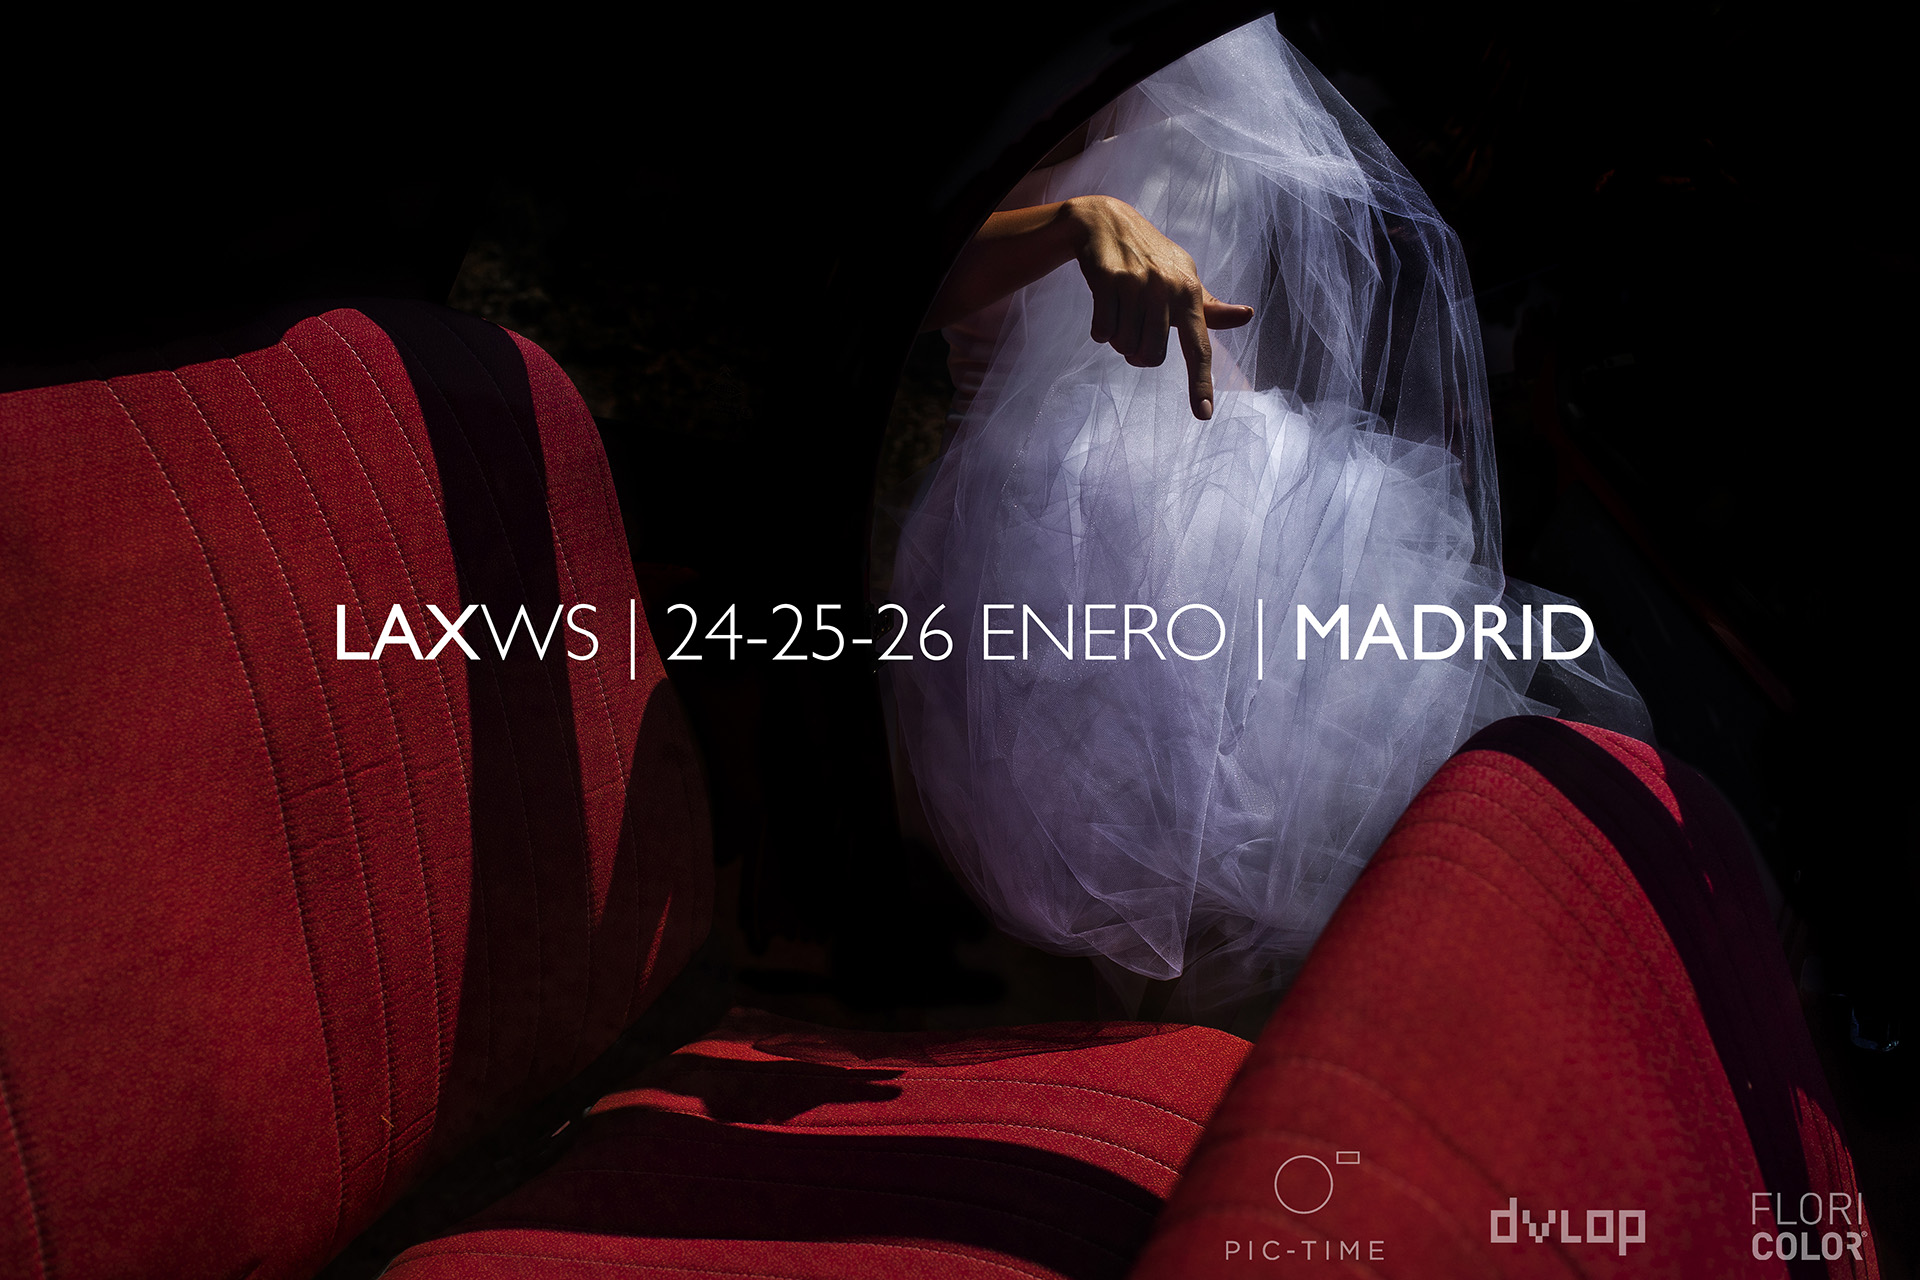 Fotógrafo de bodas, Fotografía de bodas, Mejor fotógrafo de bodas, Victor Lax, Erika Biarnes, mejor fotógrafo de bodas en Madrid, Fotografía de bodas, taller de fotografía de bodas